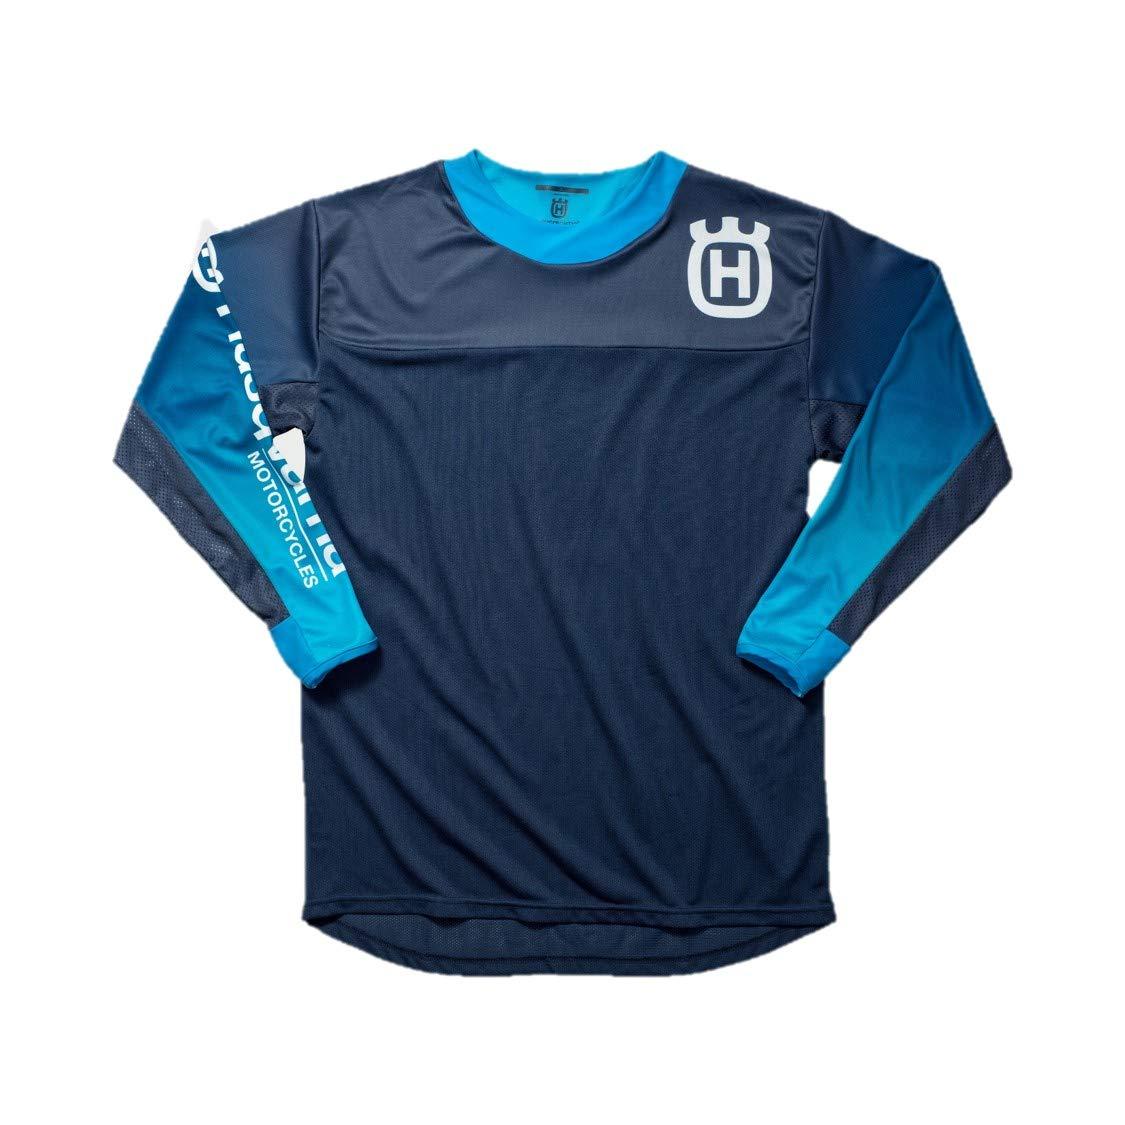 Husqvarna Gotland Jersey (XL, Blue) by Husqvarna